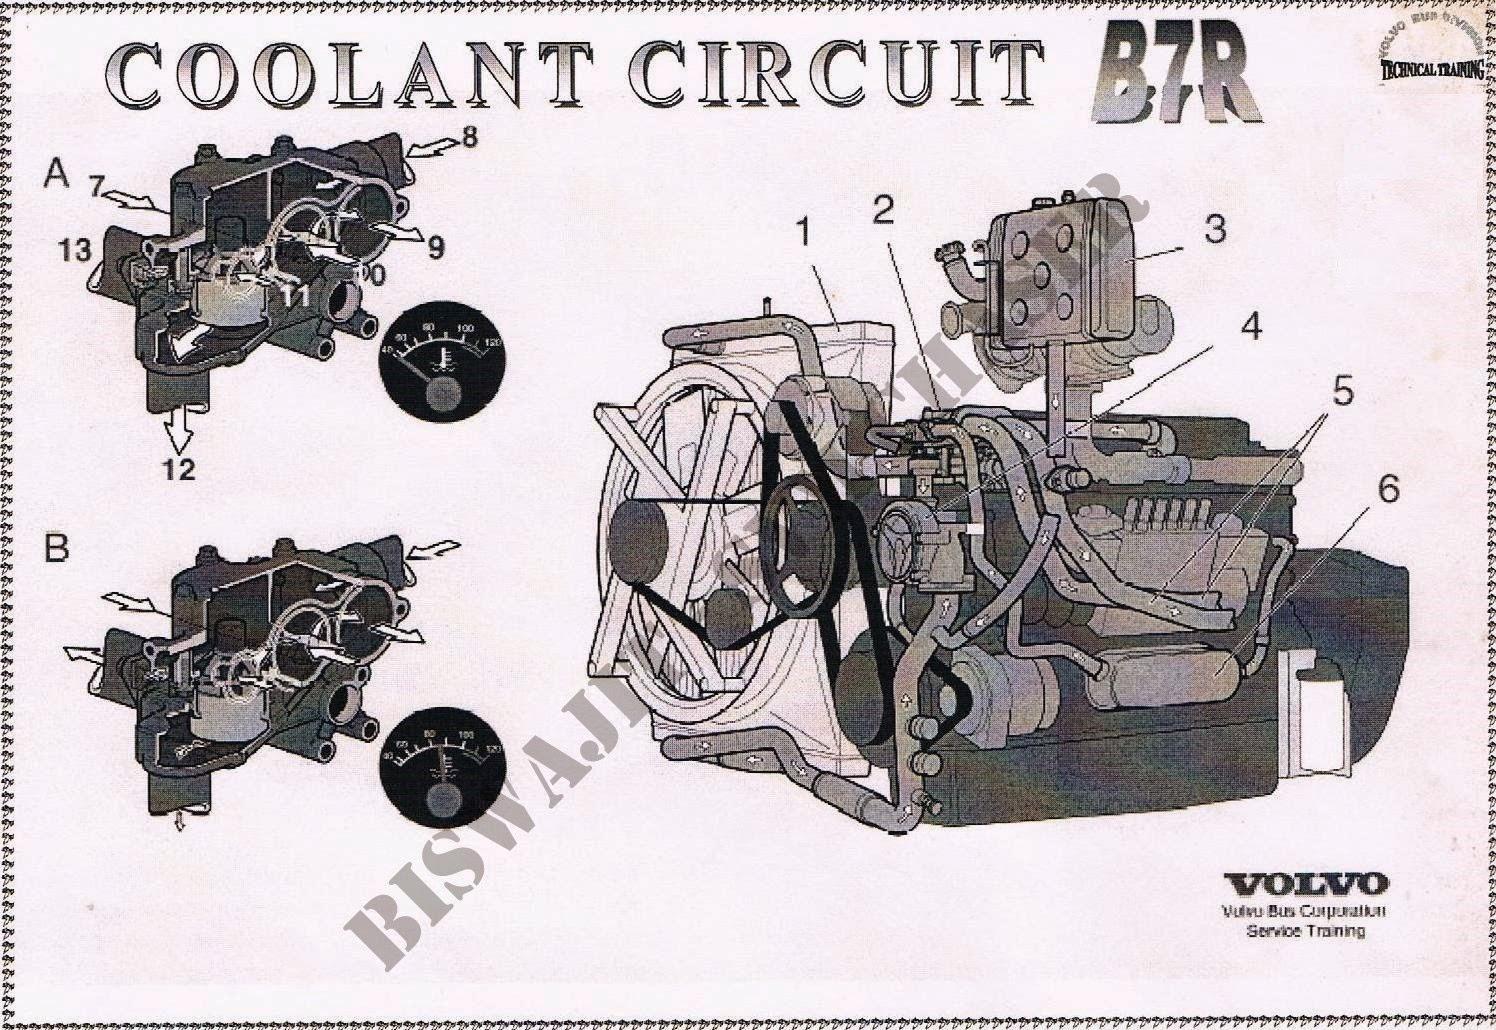 biswajit svm chaser volvo b7r coolant circuit rh biswajit svmchaser blogspot com